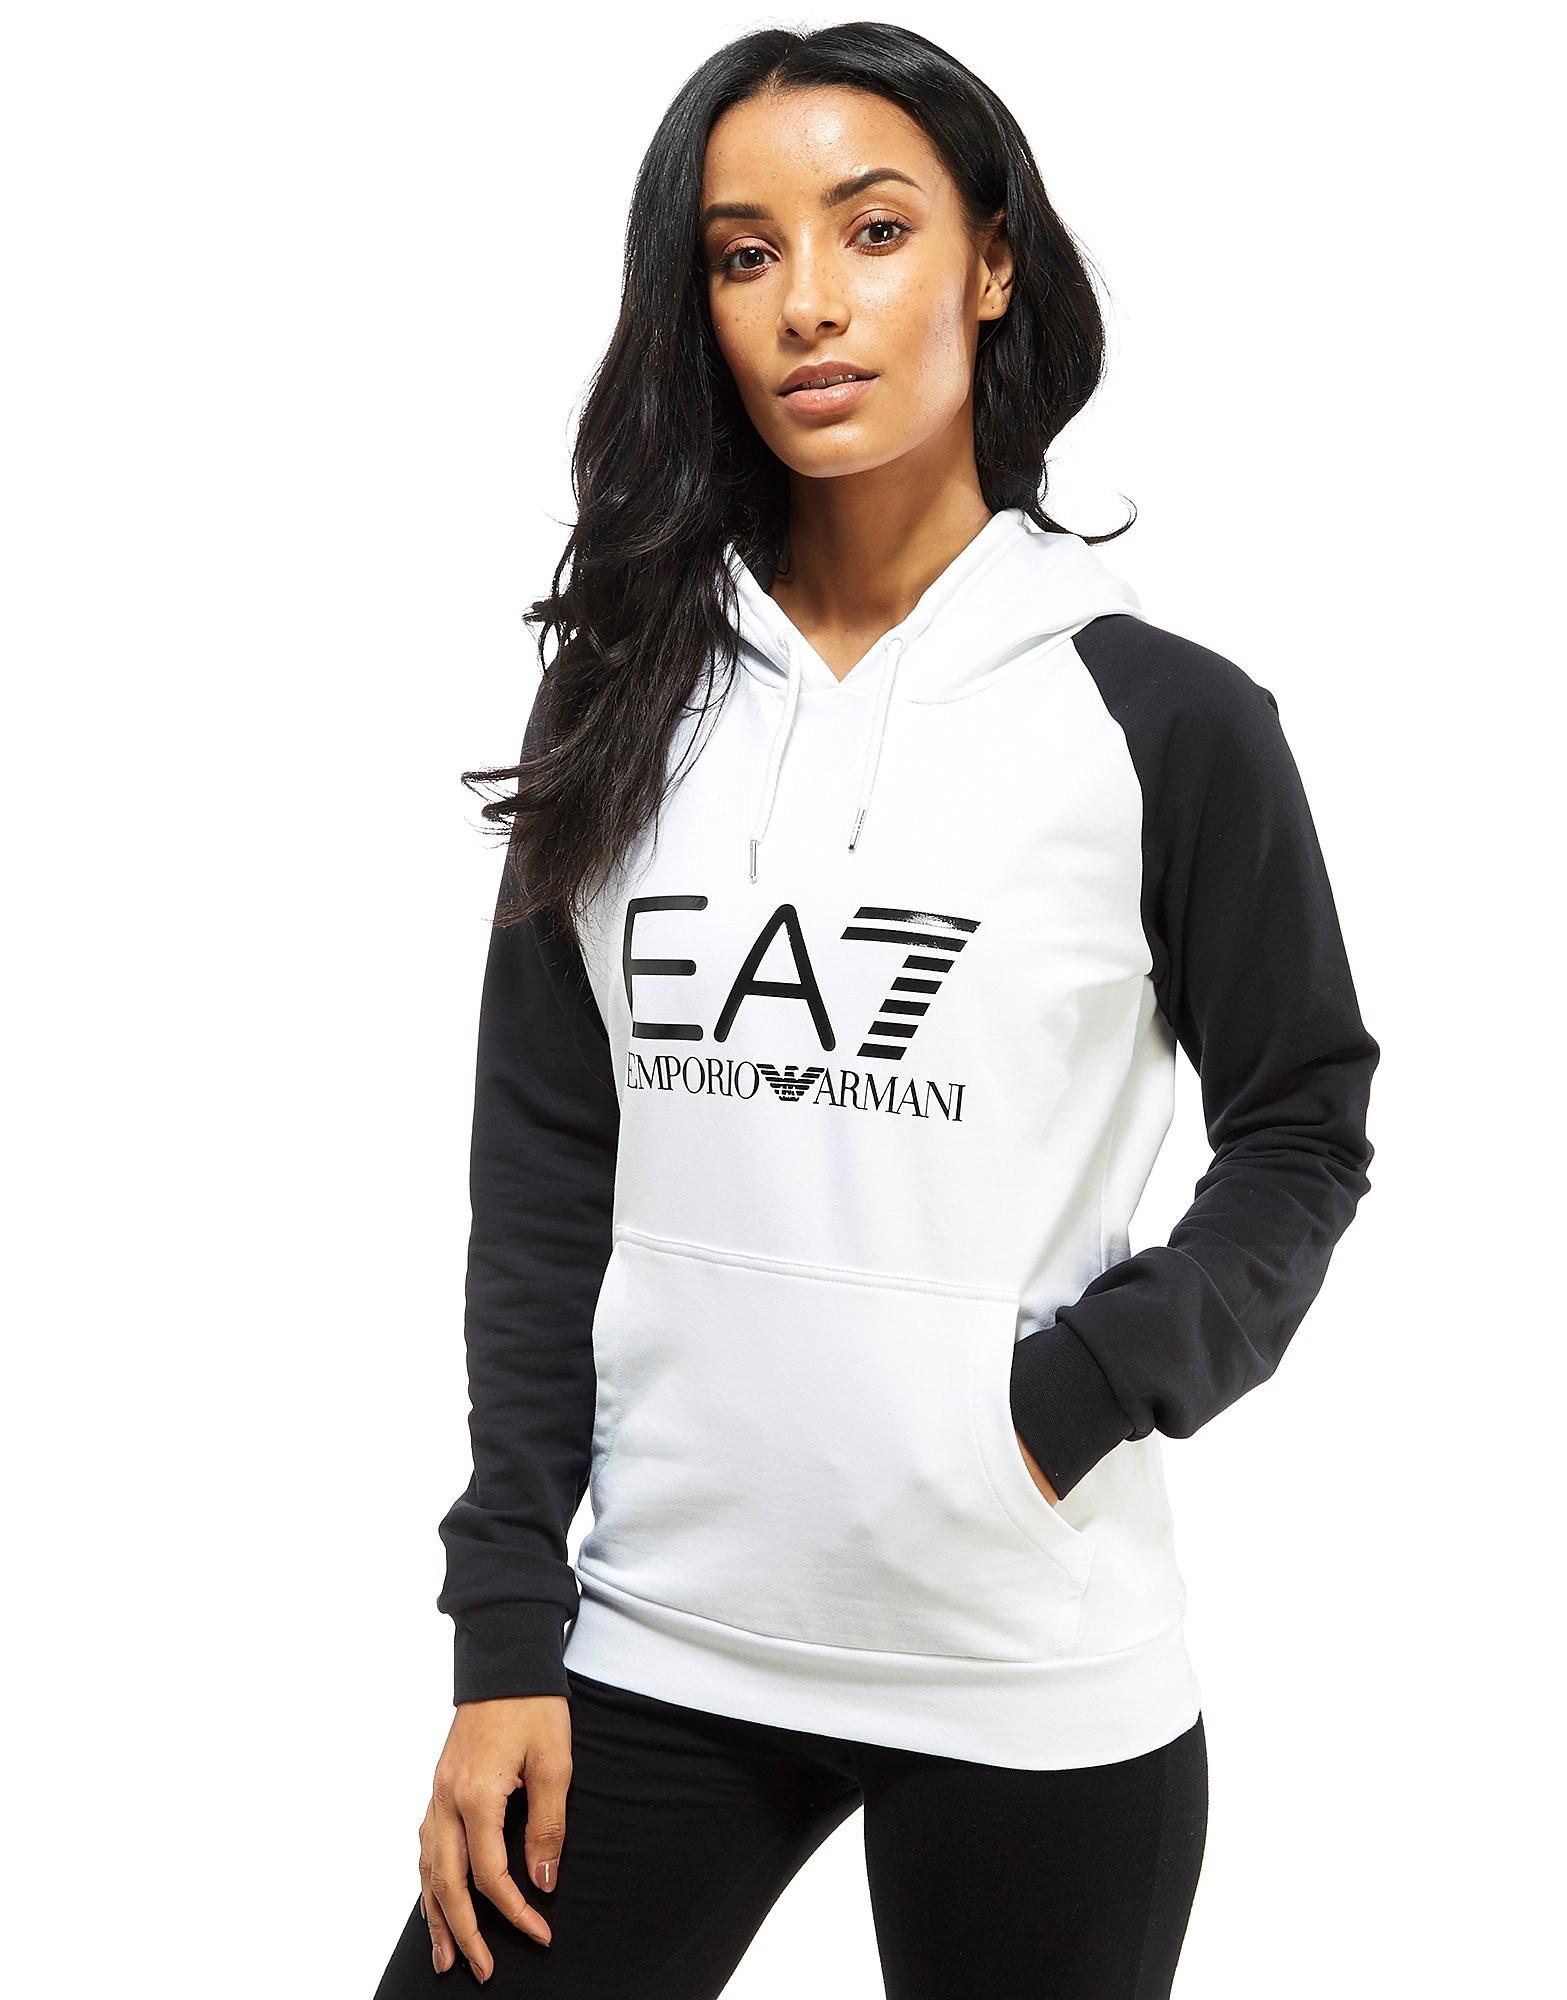 Emporio Armani EA7 Fleece Overhead Hoody